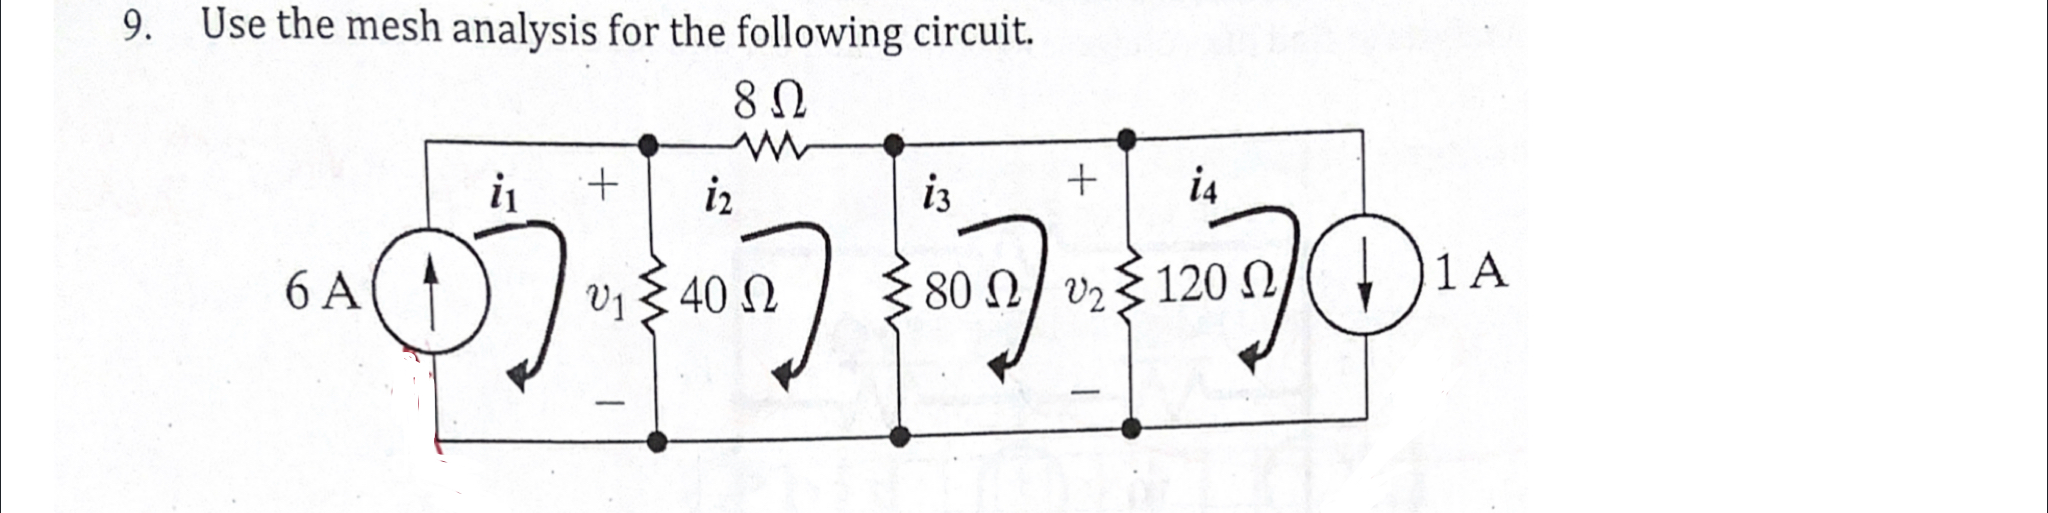 J. USE IH ΠESH analysis for the following circuit. 8Ω I i1 + i, «Ο) 50. Γυξ40 Ω   ξ80 Ω/υξ120 Ω/(;)1A